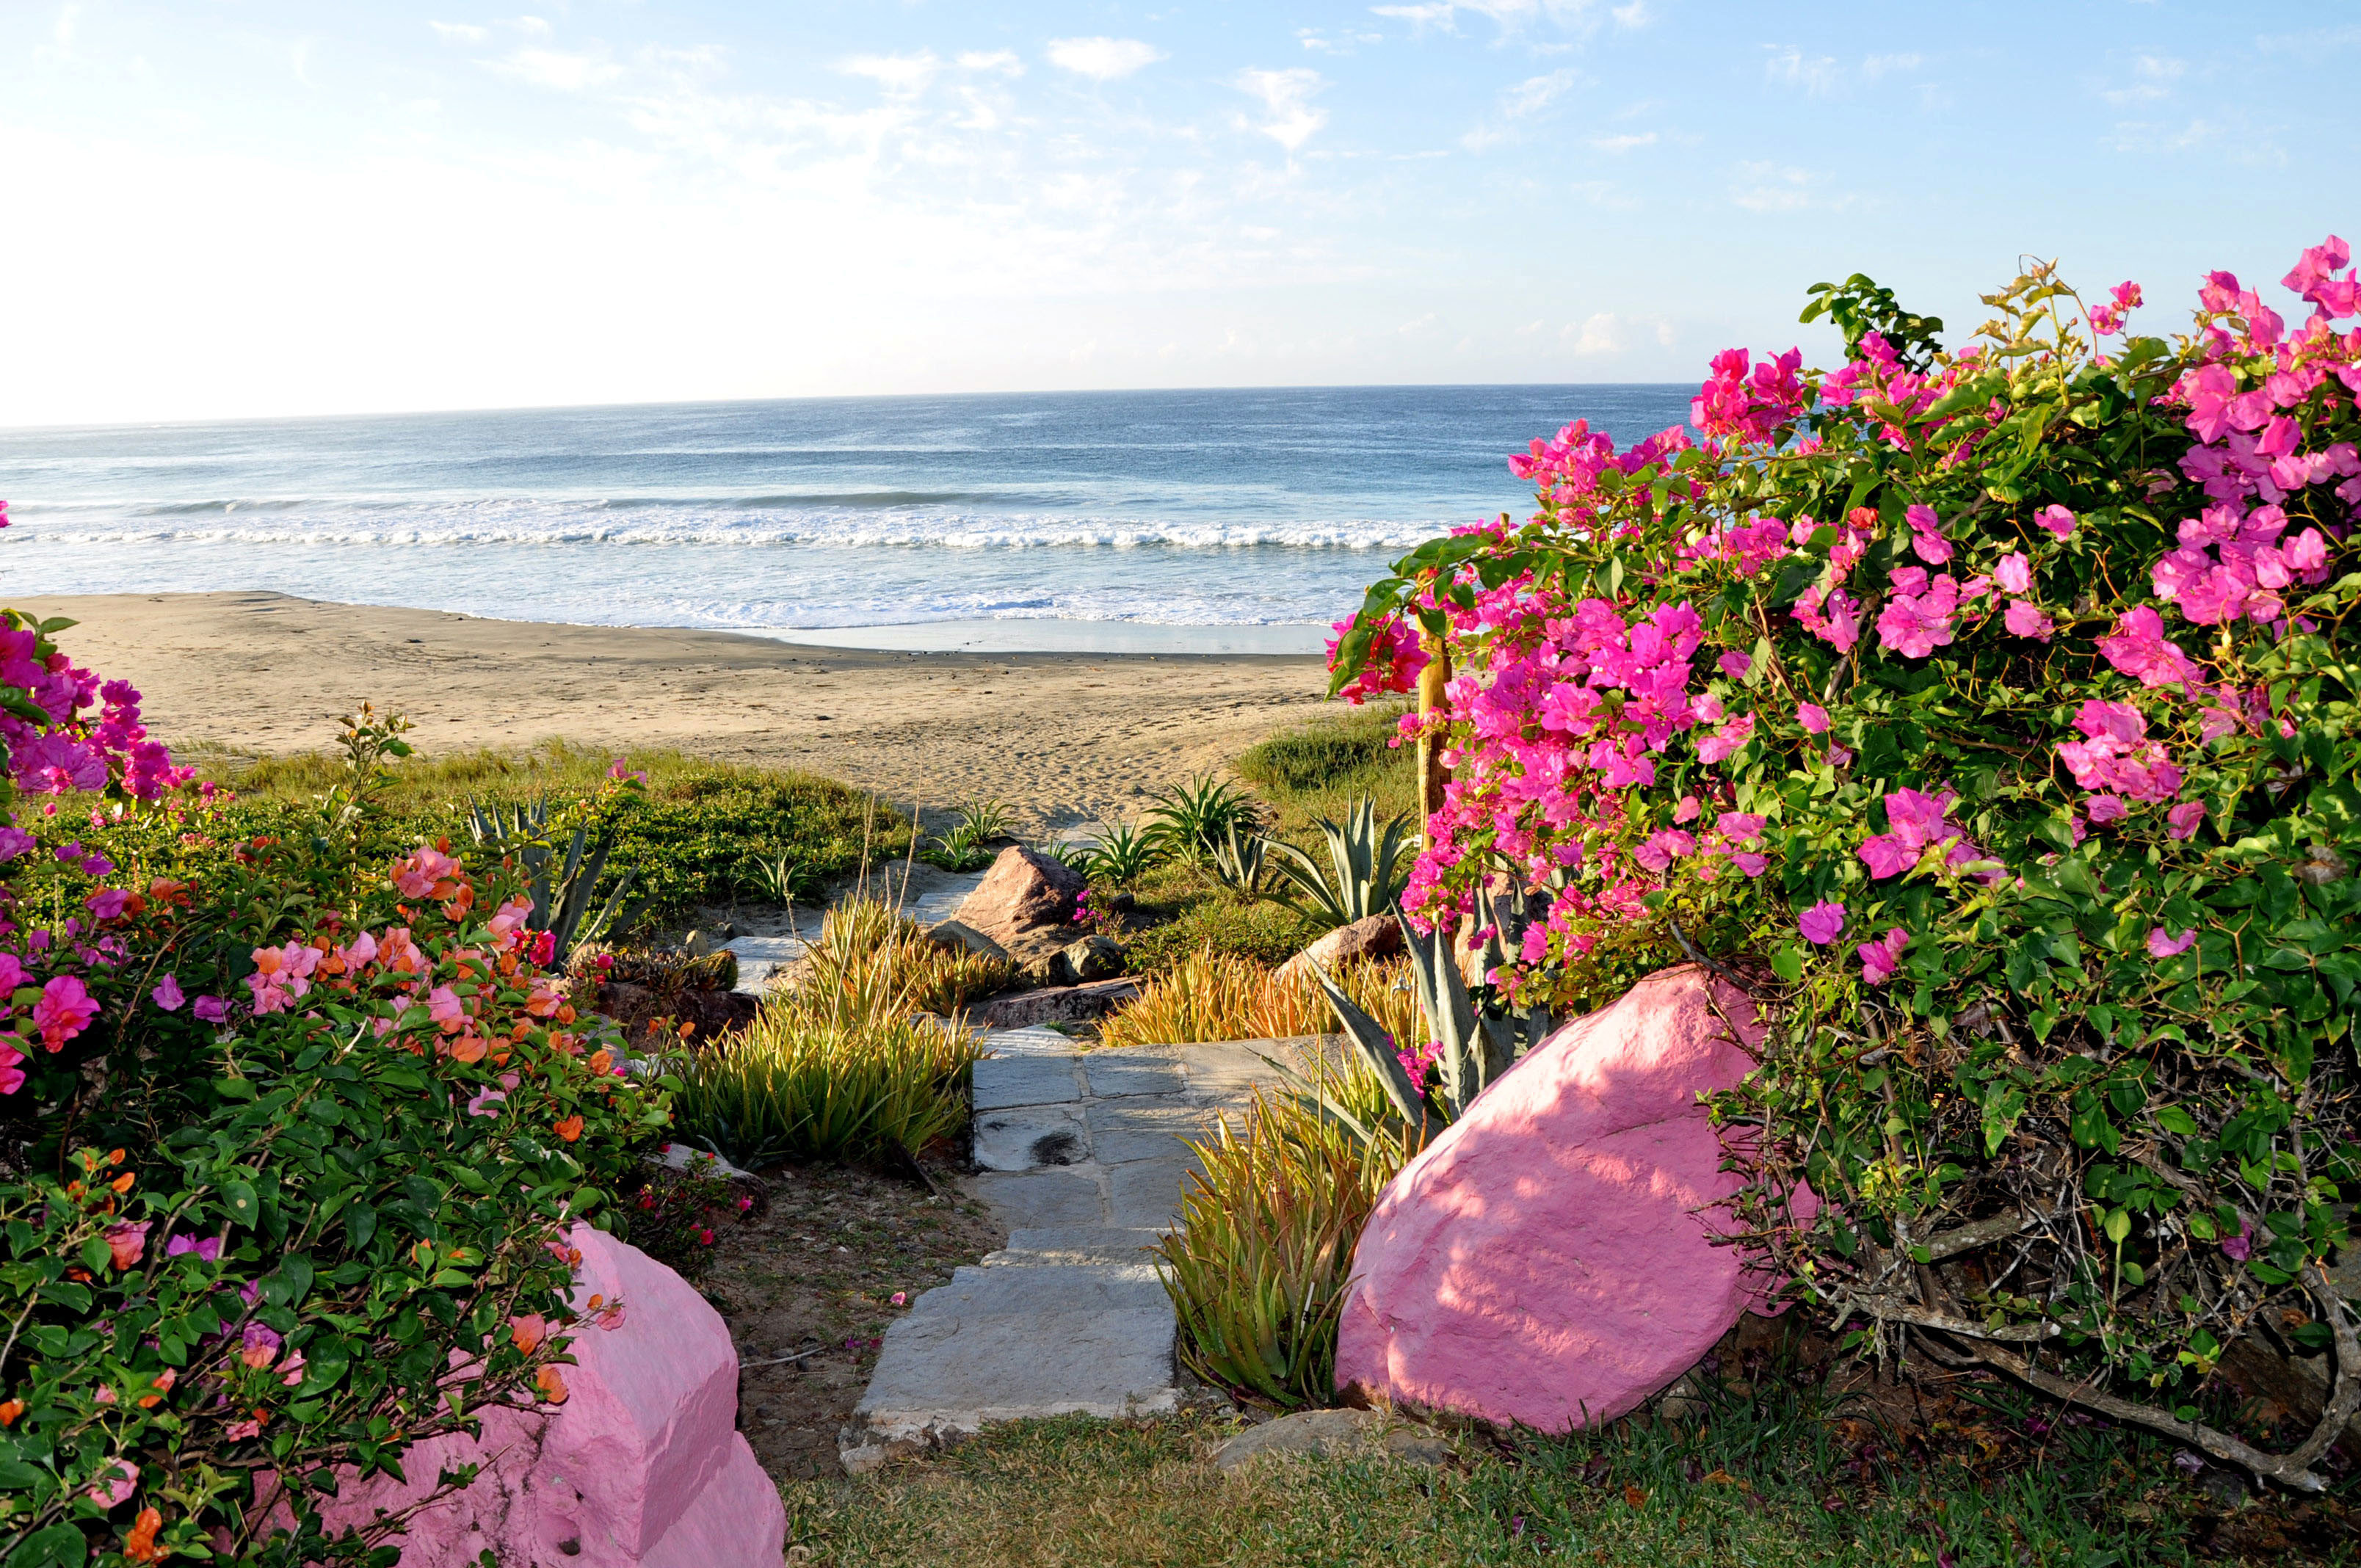 Beach Beachfront Grounds Scenic views sky flower grass flora shore Coast pink Sea plant Garden lawn colorful